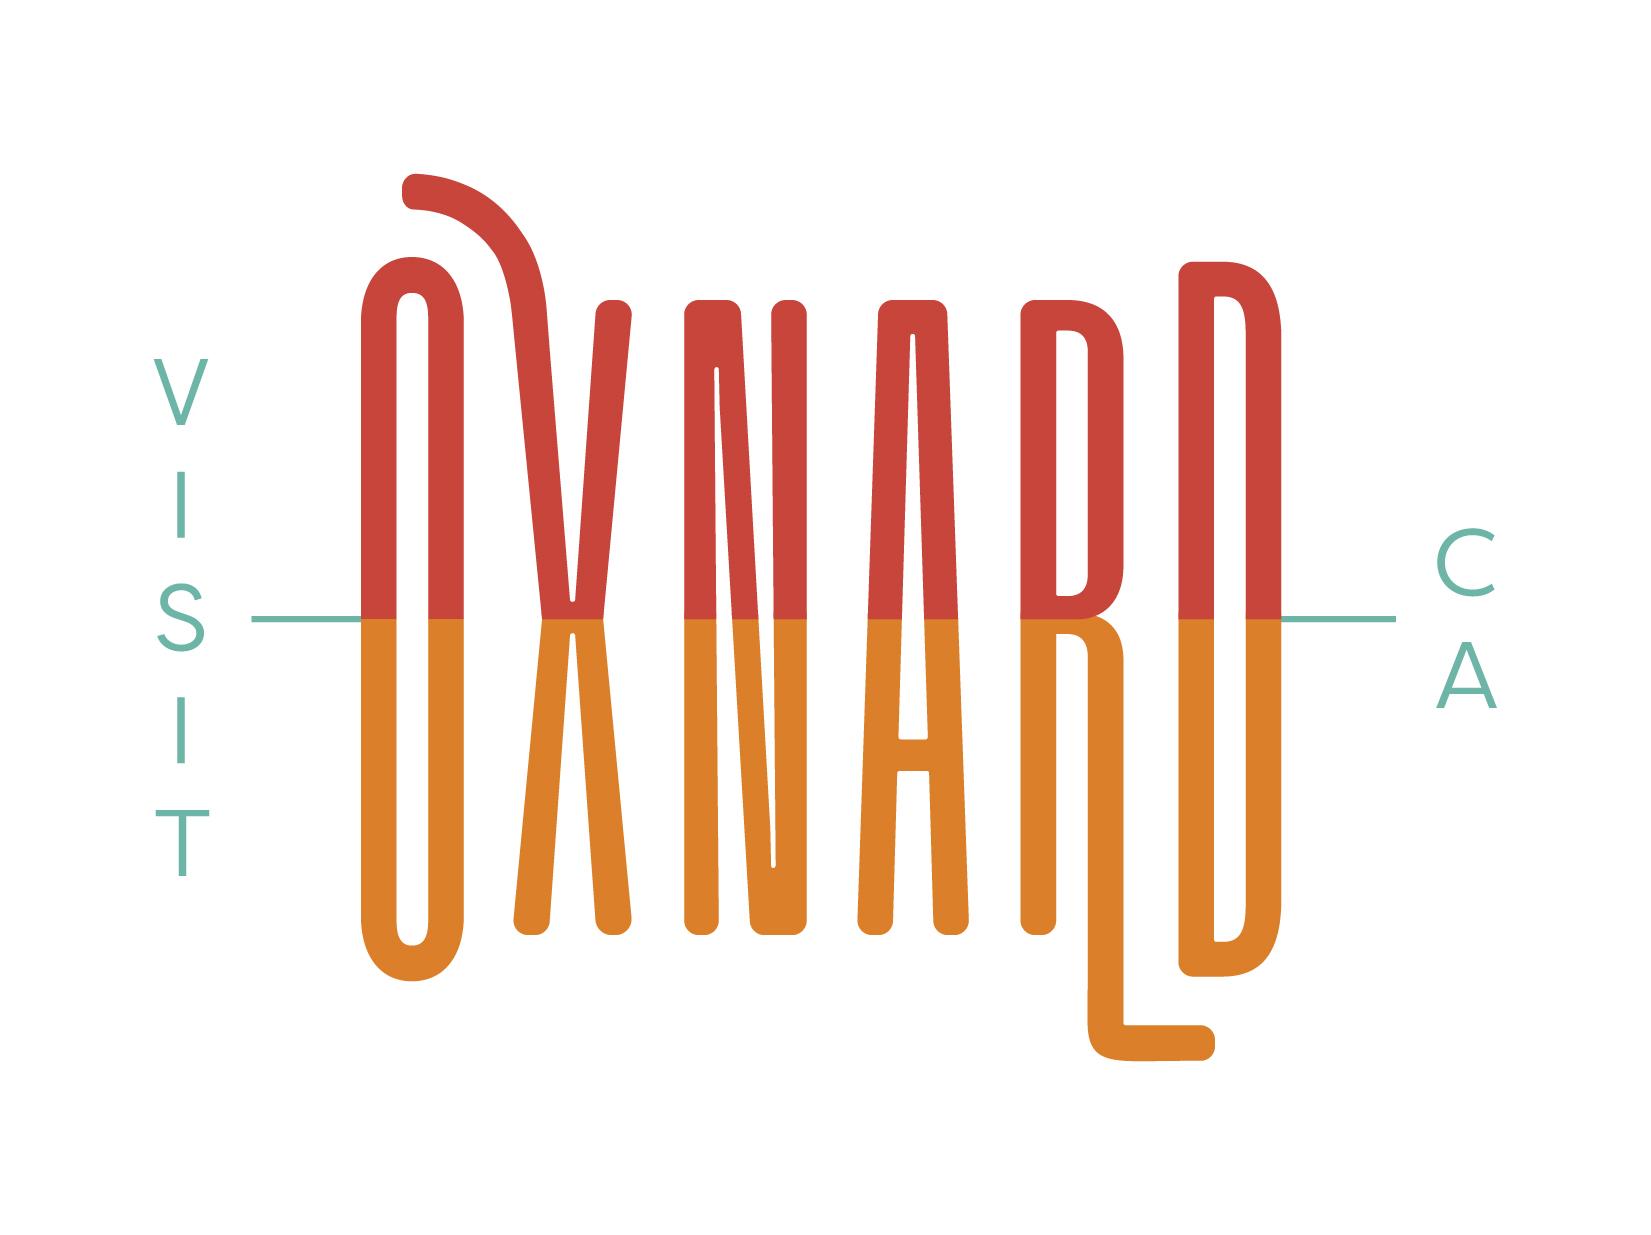 Visit Oxnard logo